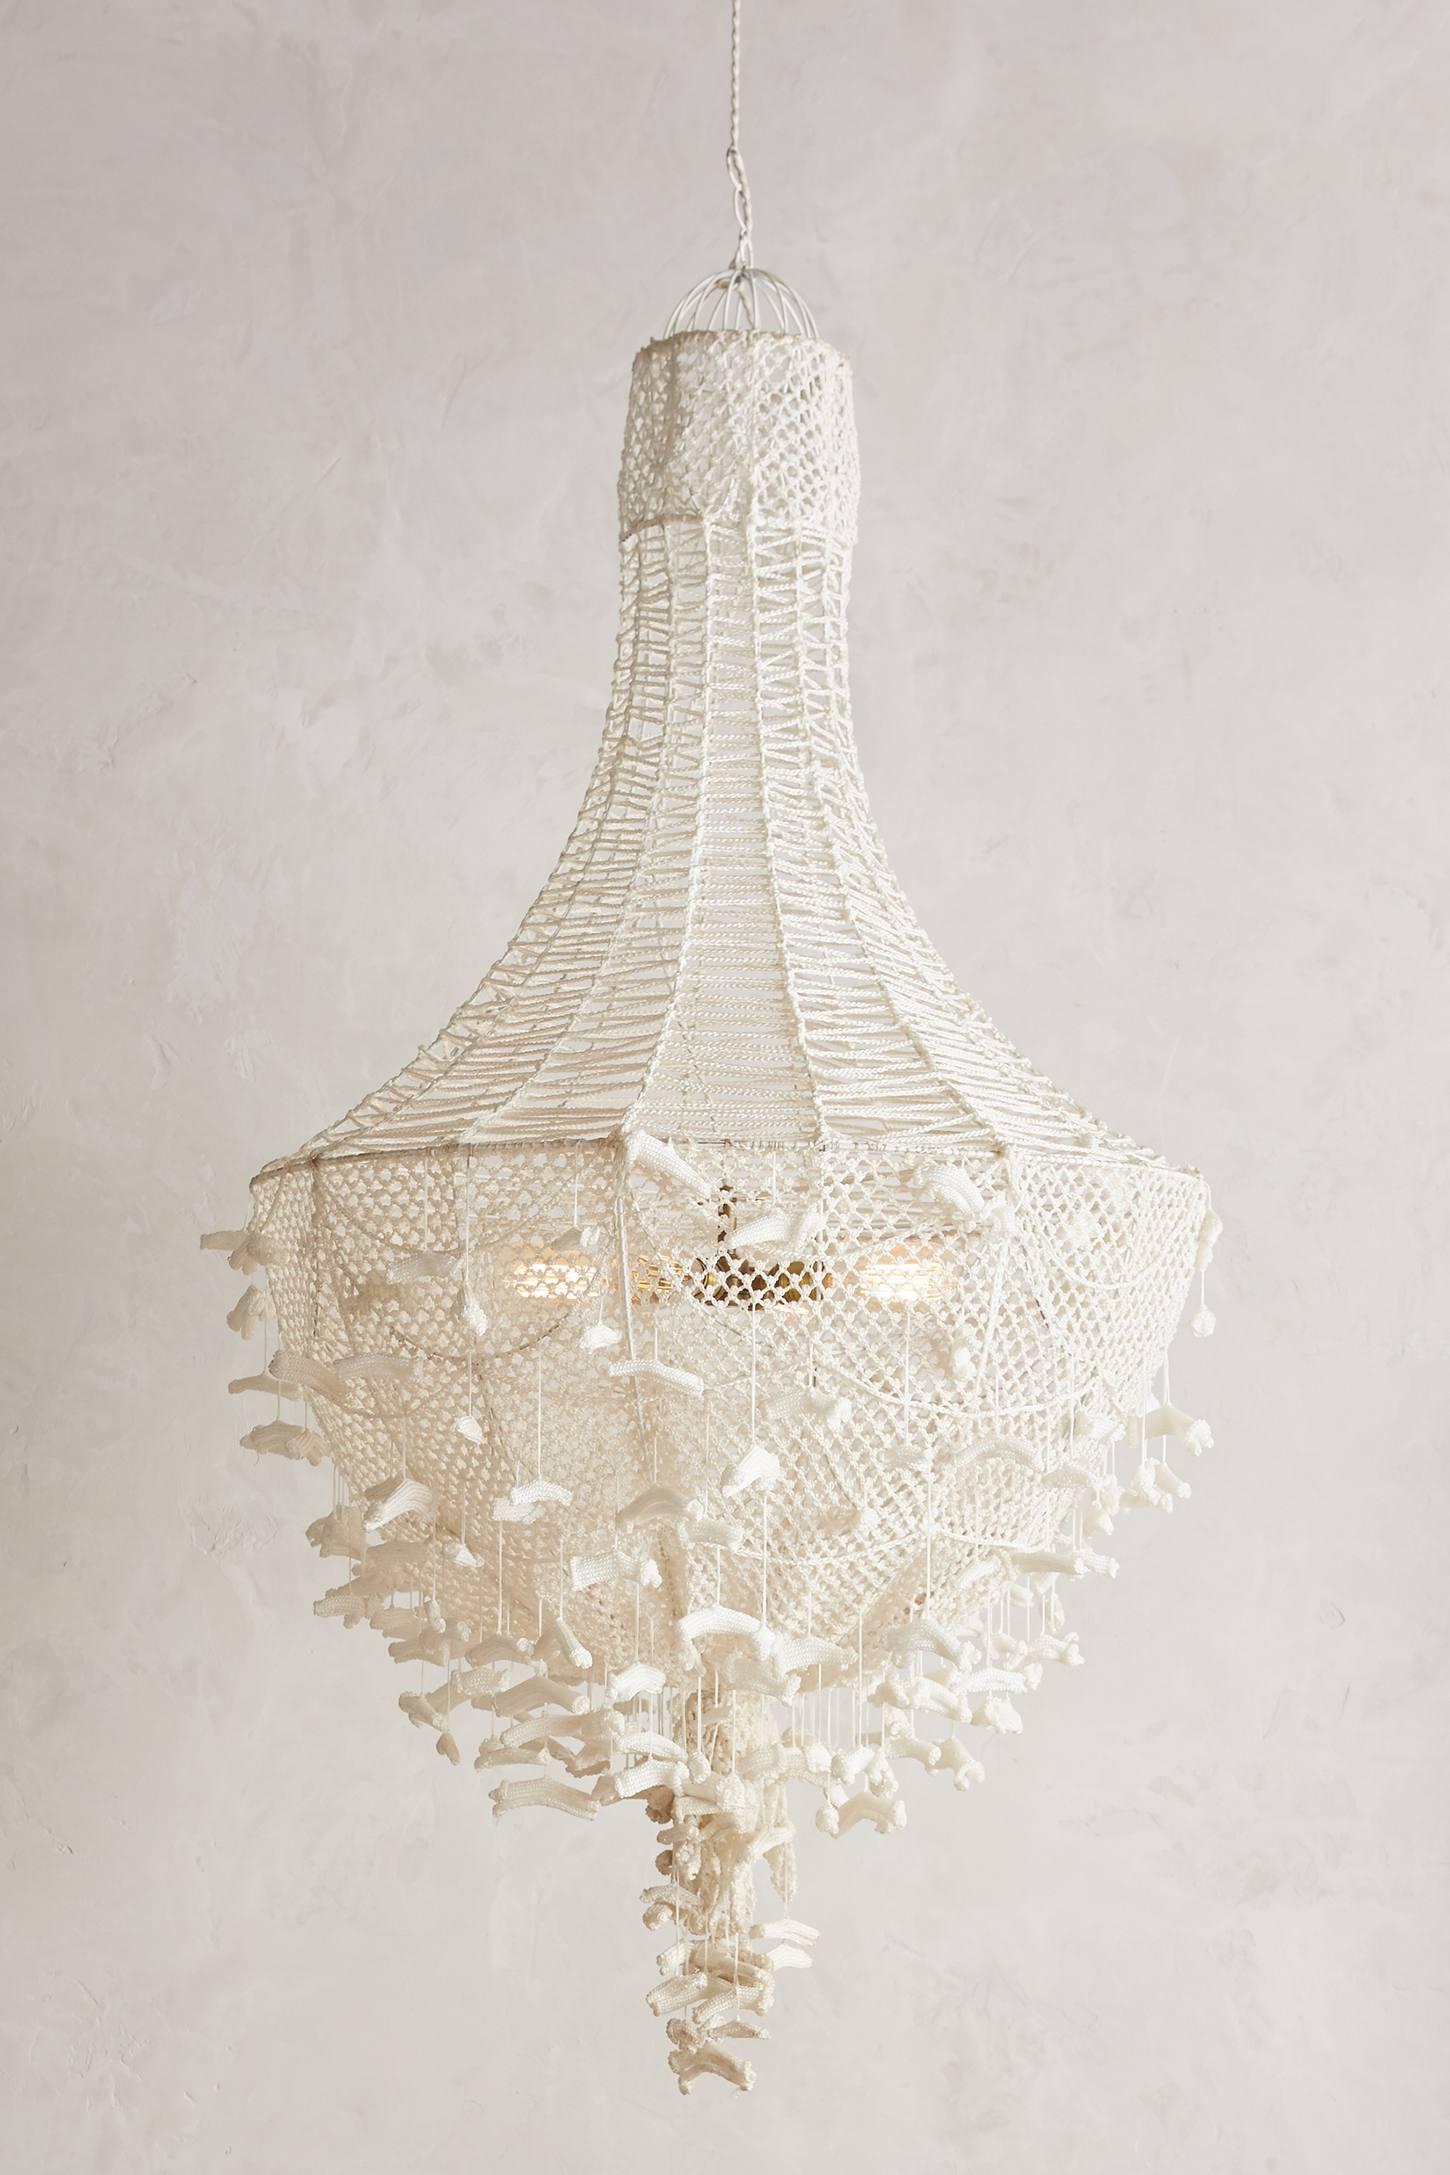 Hand-Knit Chandelier